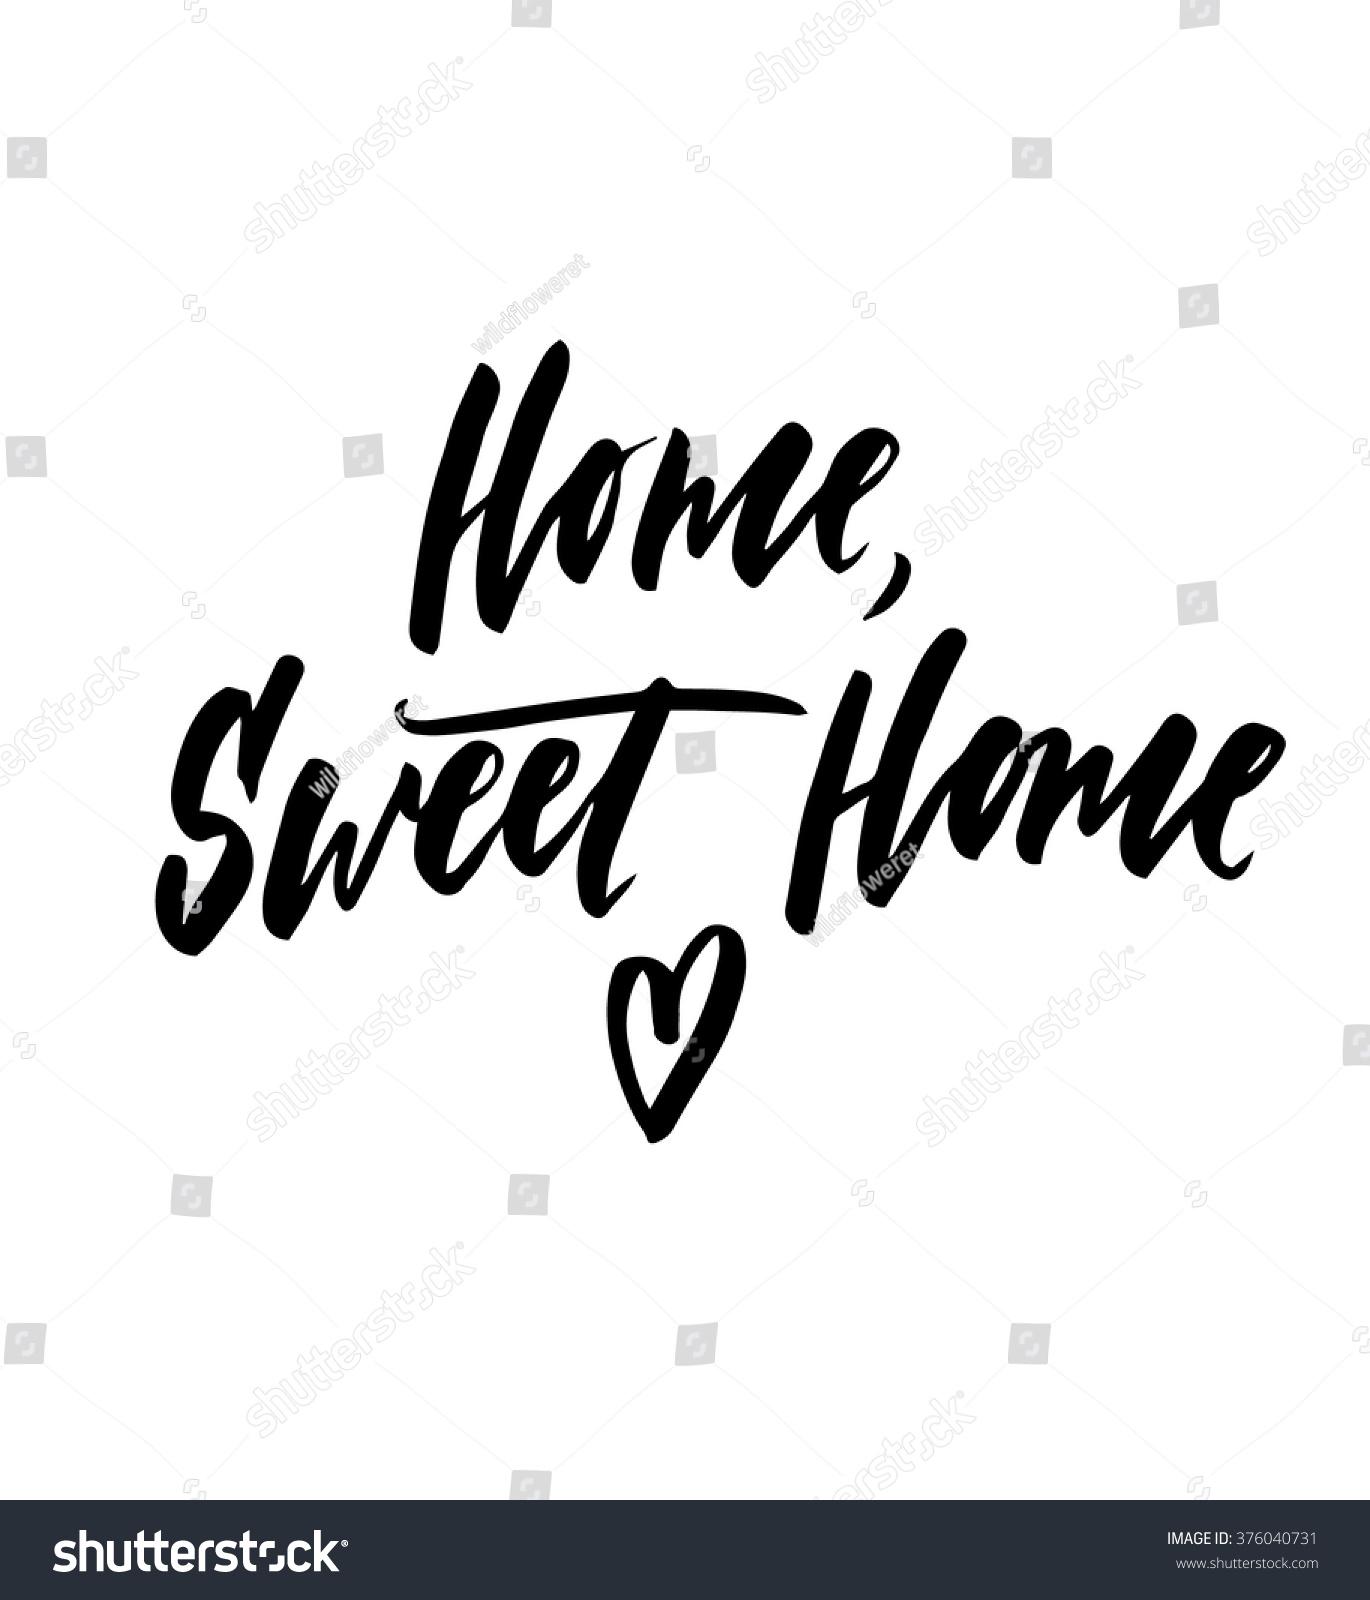 Home Sweet Home Black White Hand Stock Vector (2018) 376040731 ...